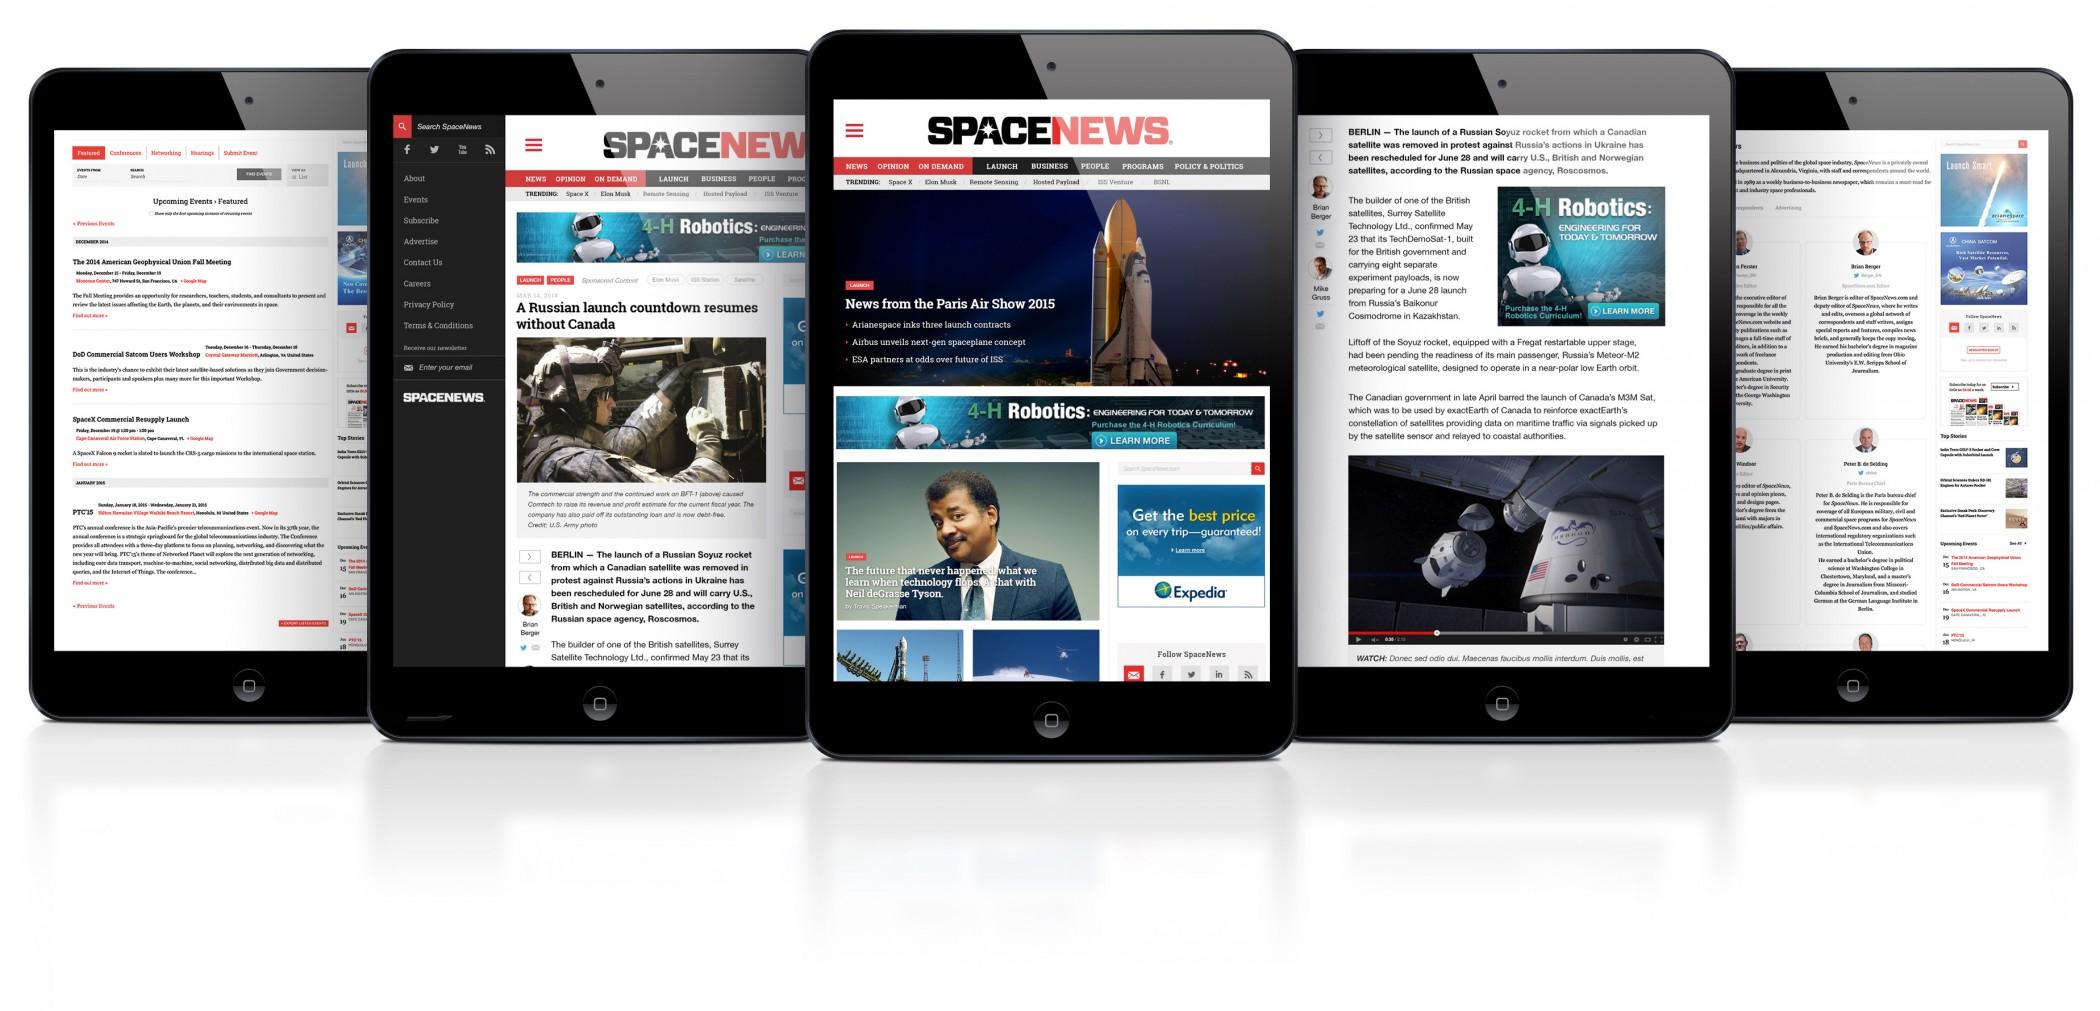 Spacenews tablet comps